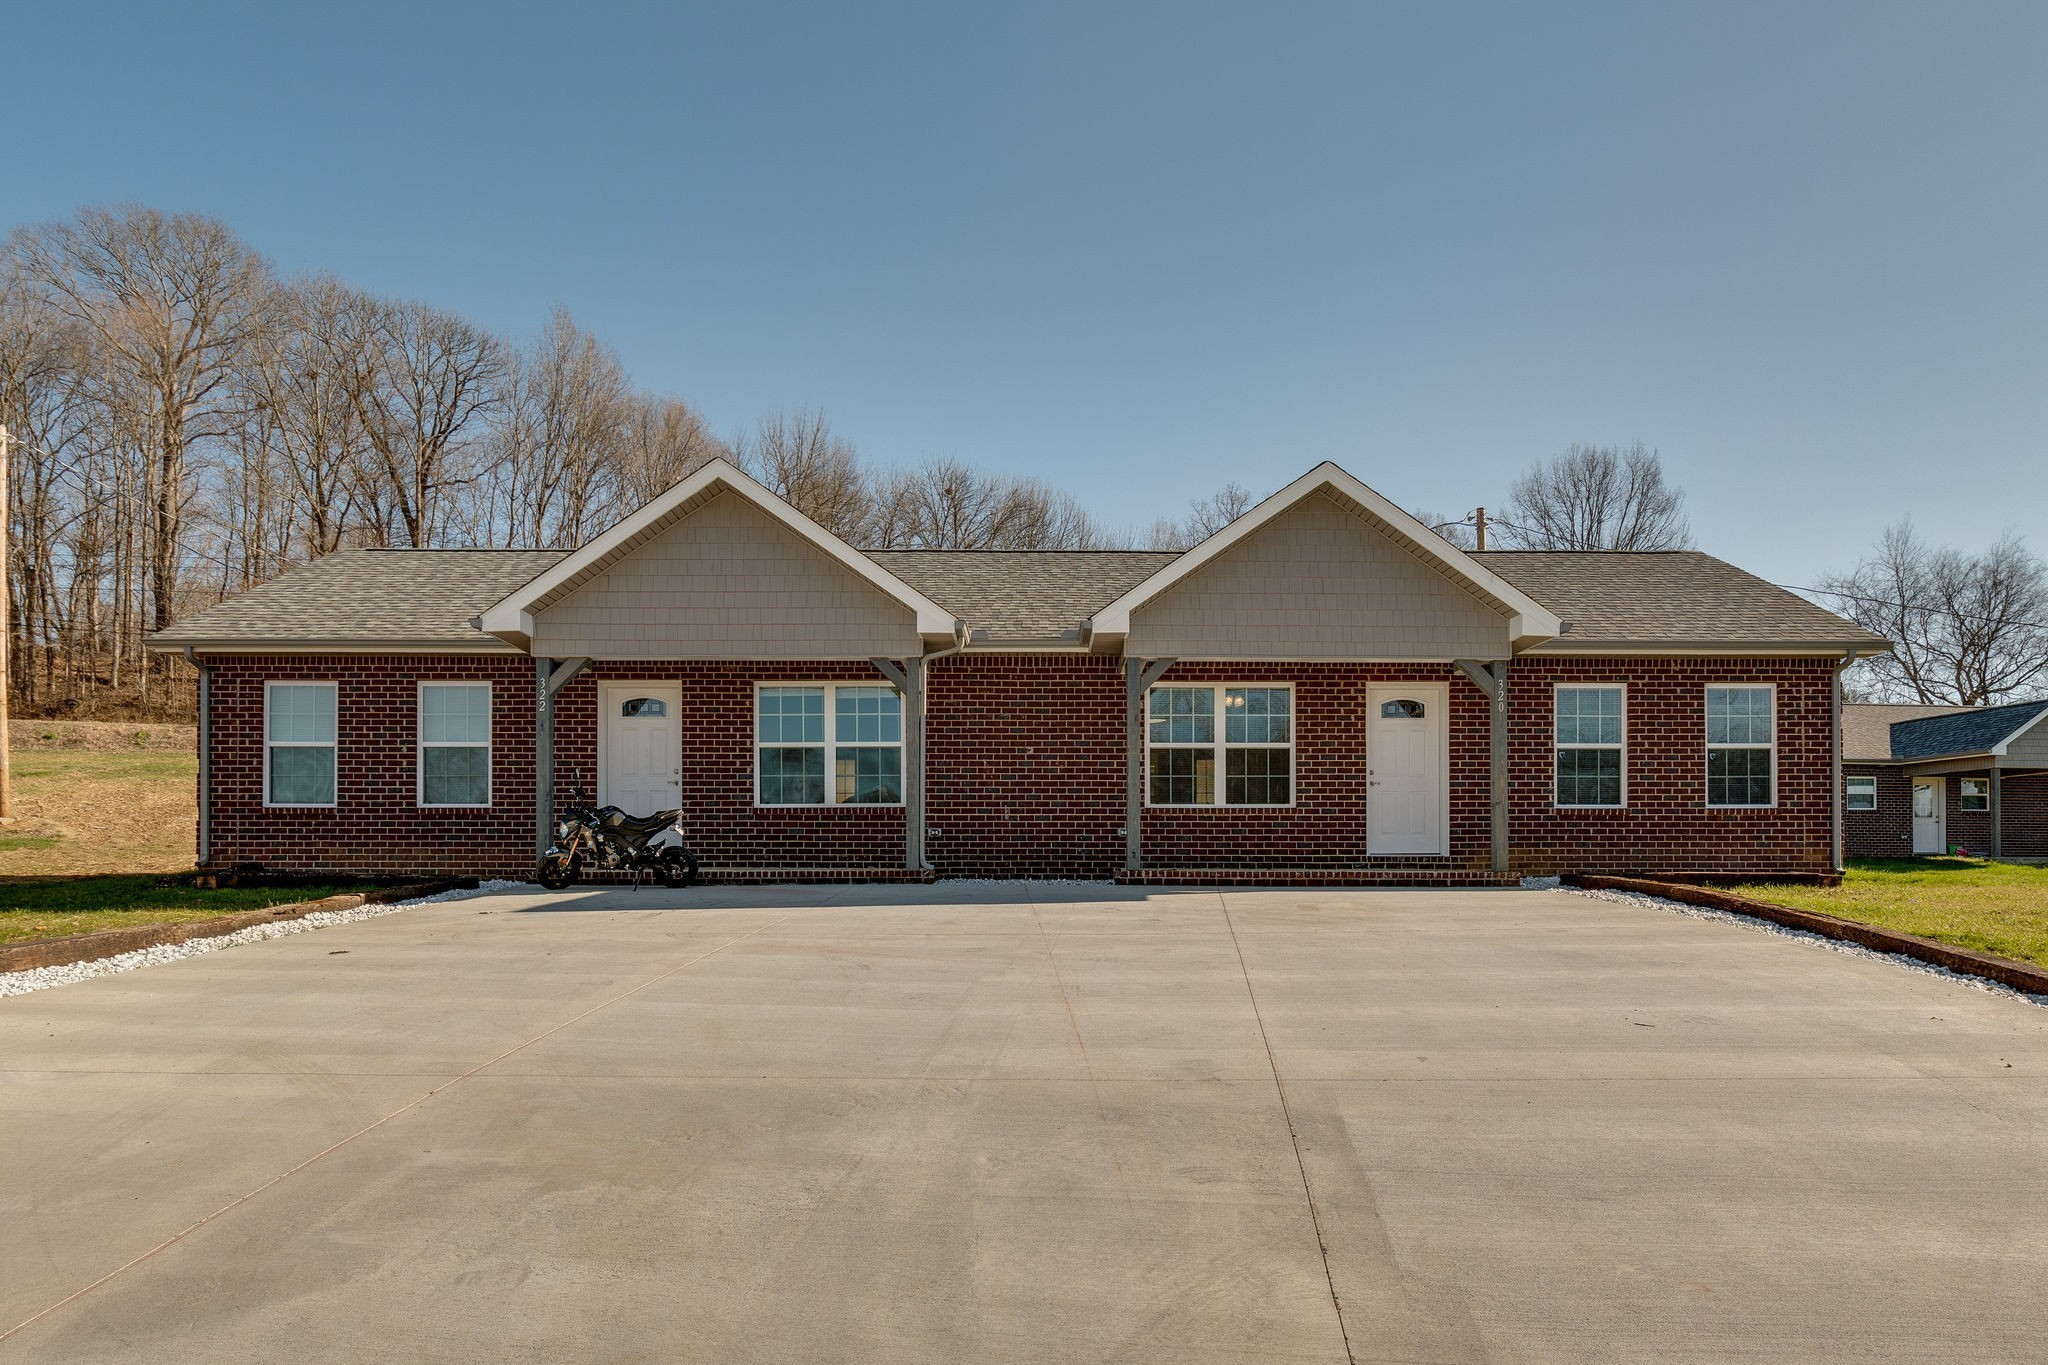 324 Blackman Blvd E Property Photo - Wartrace, TN real estate listing